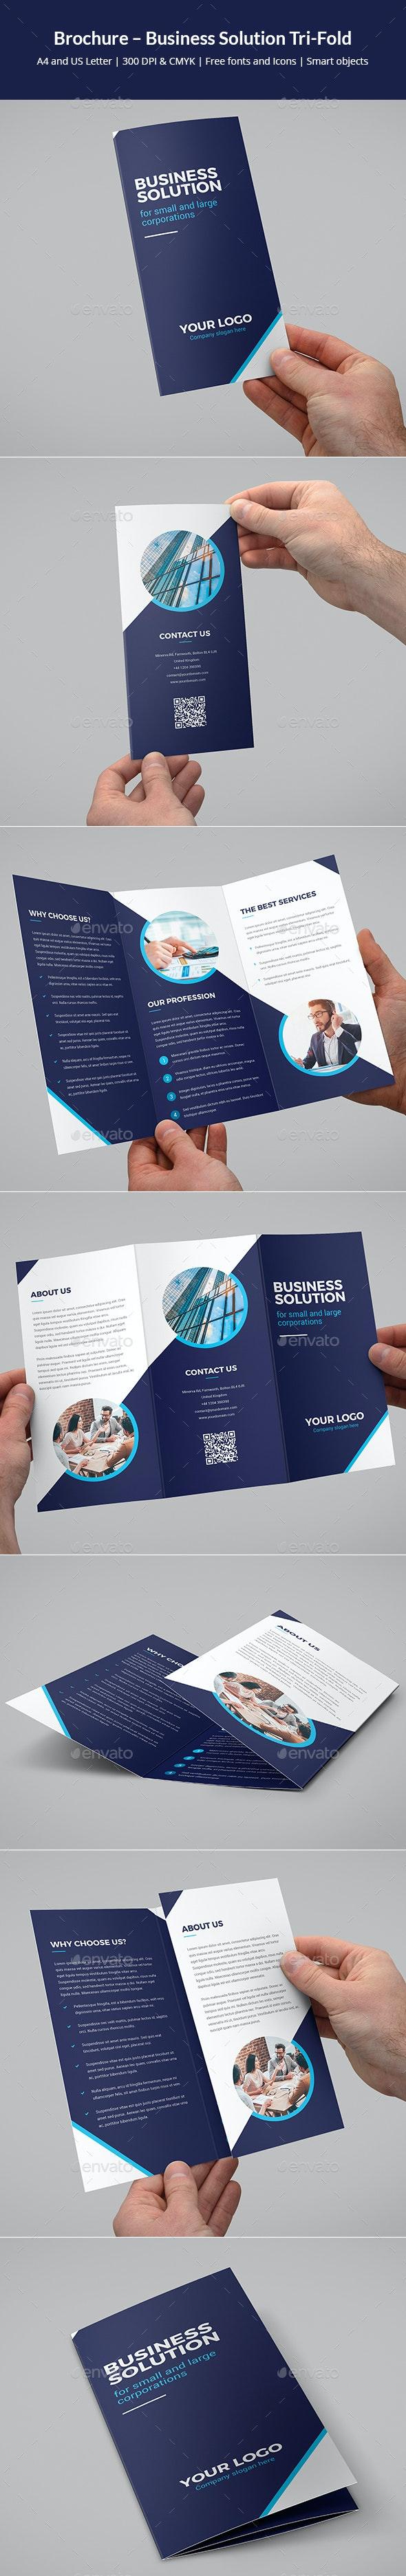 Brochure – Business Solution Tri-Fold - Corporate Brochures